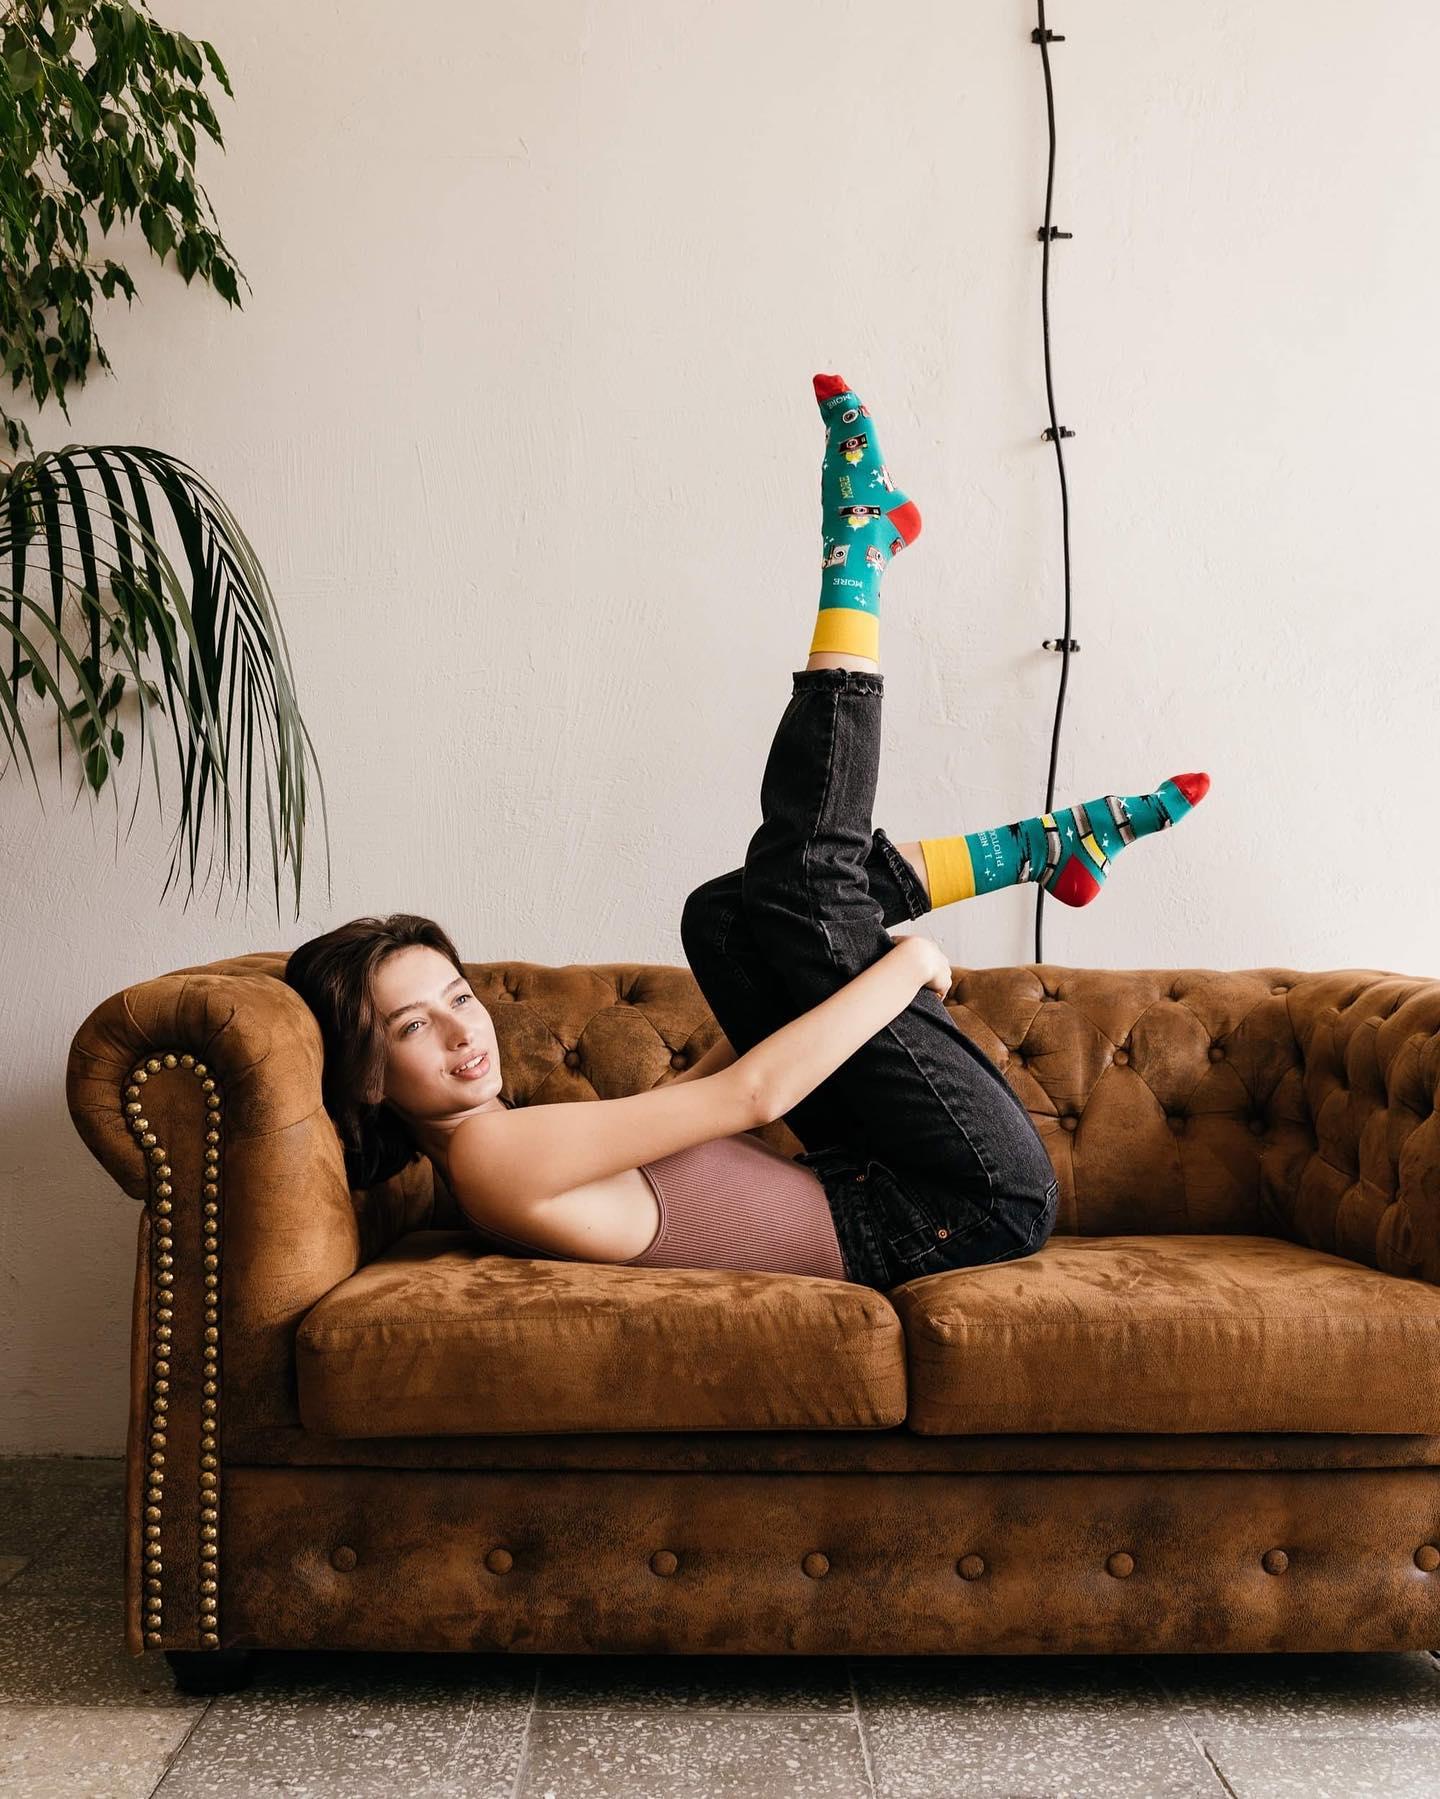 Czy znasz już ten wzór skarpetek? 🙃 . . . . #skarpetki #socks #ilovesocks #more #moresocks #mismatchedsocks #cotton #bawełna #girl #ınstagirl #kanapa #sofa #picoftheday #legs #chill #smile #photographer